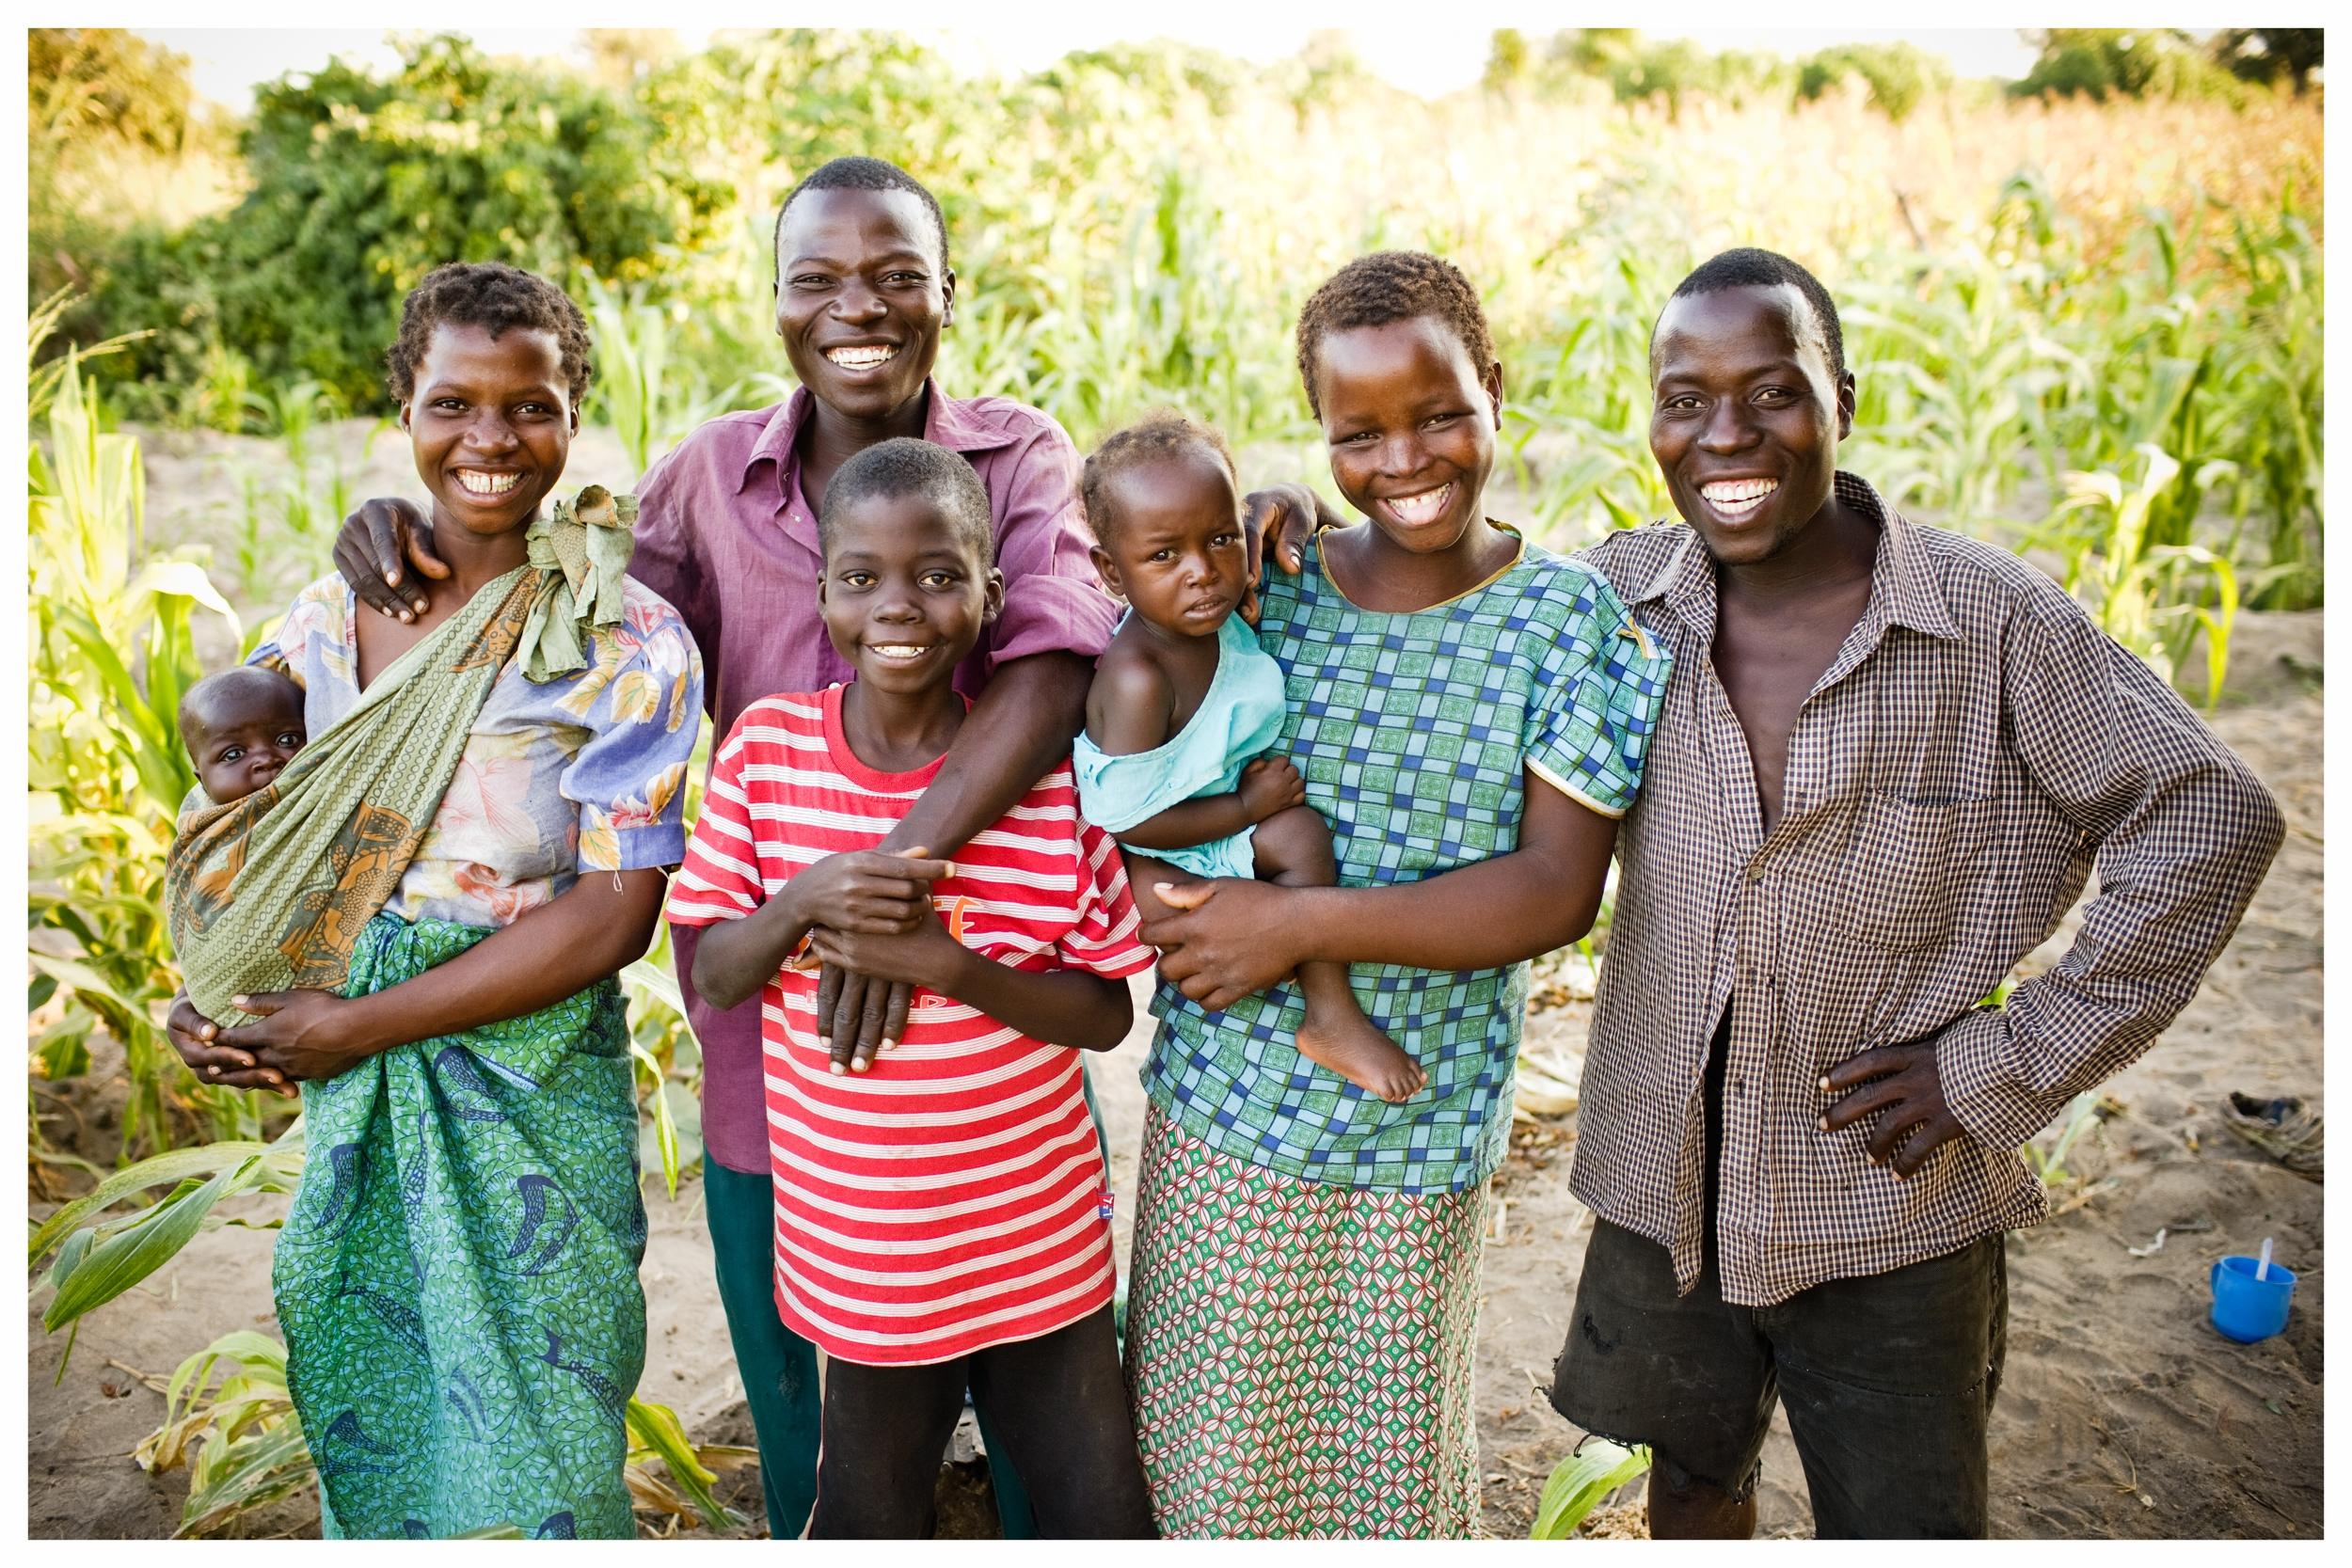 Andrew and family. Fombe, Chikwawa, Malawi. Photo © Marcus Perkins